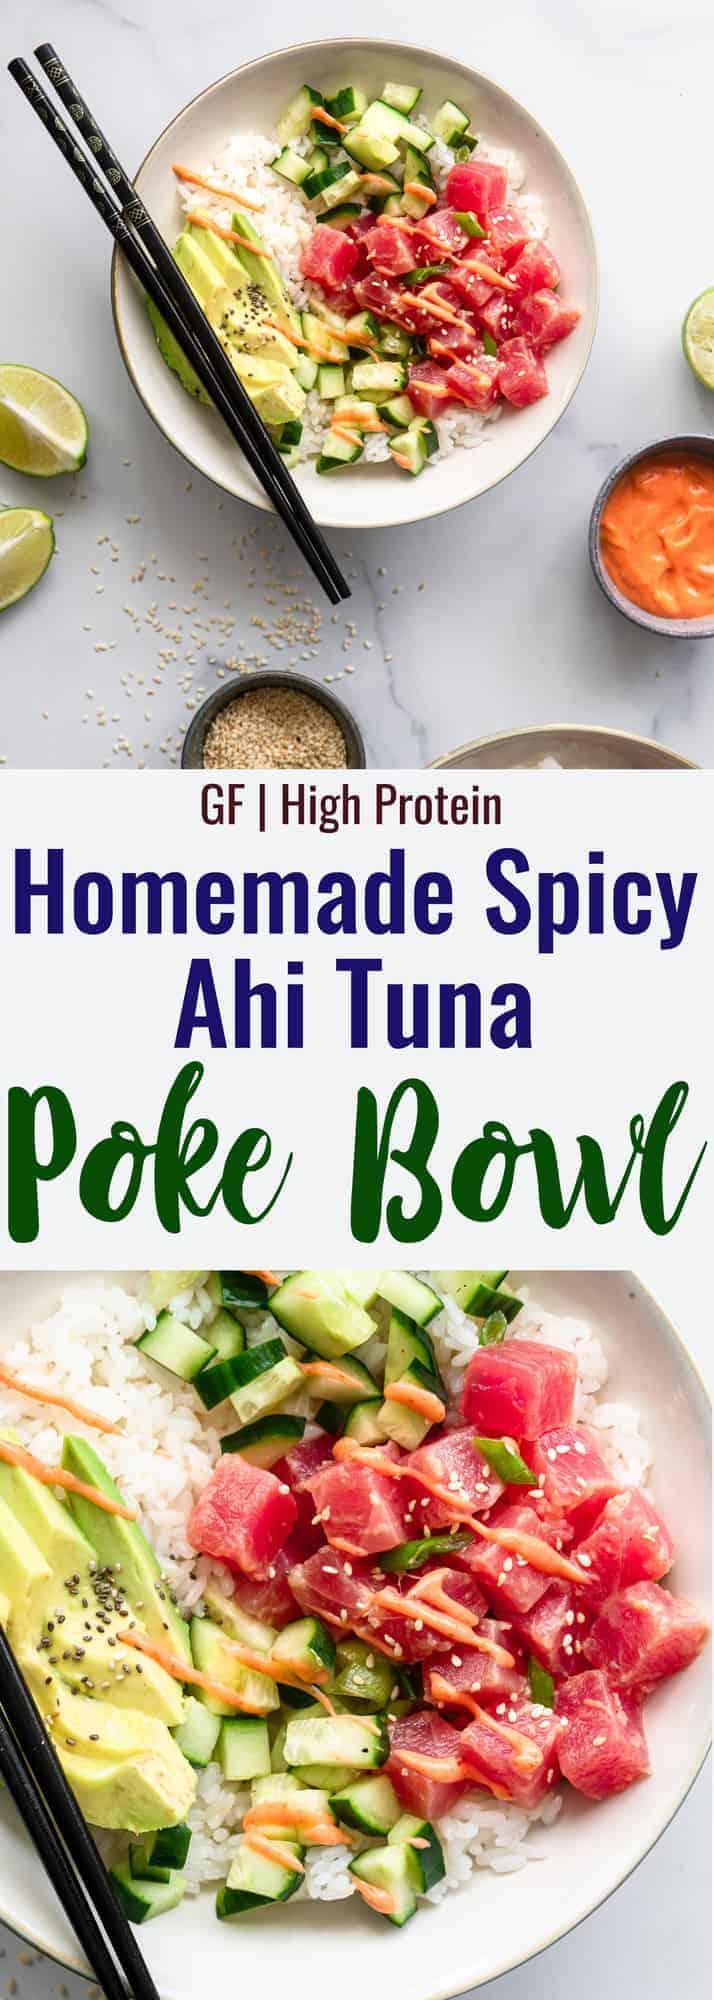 tuna poke bowl recipe collage photo